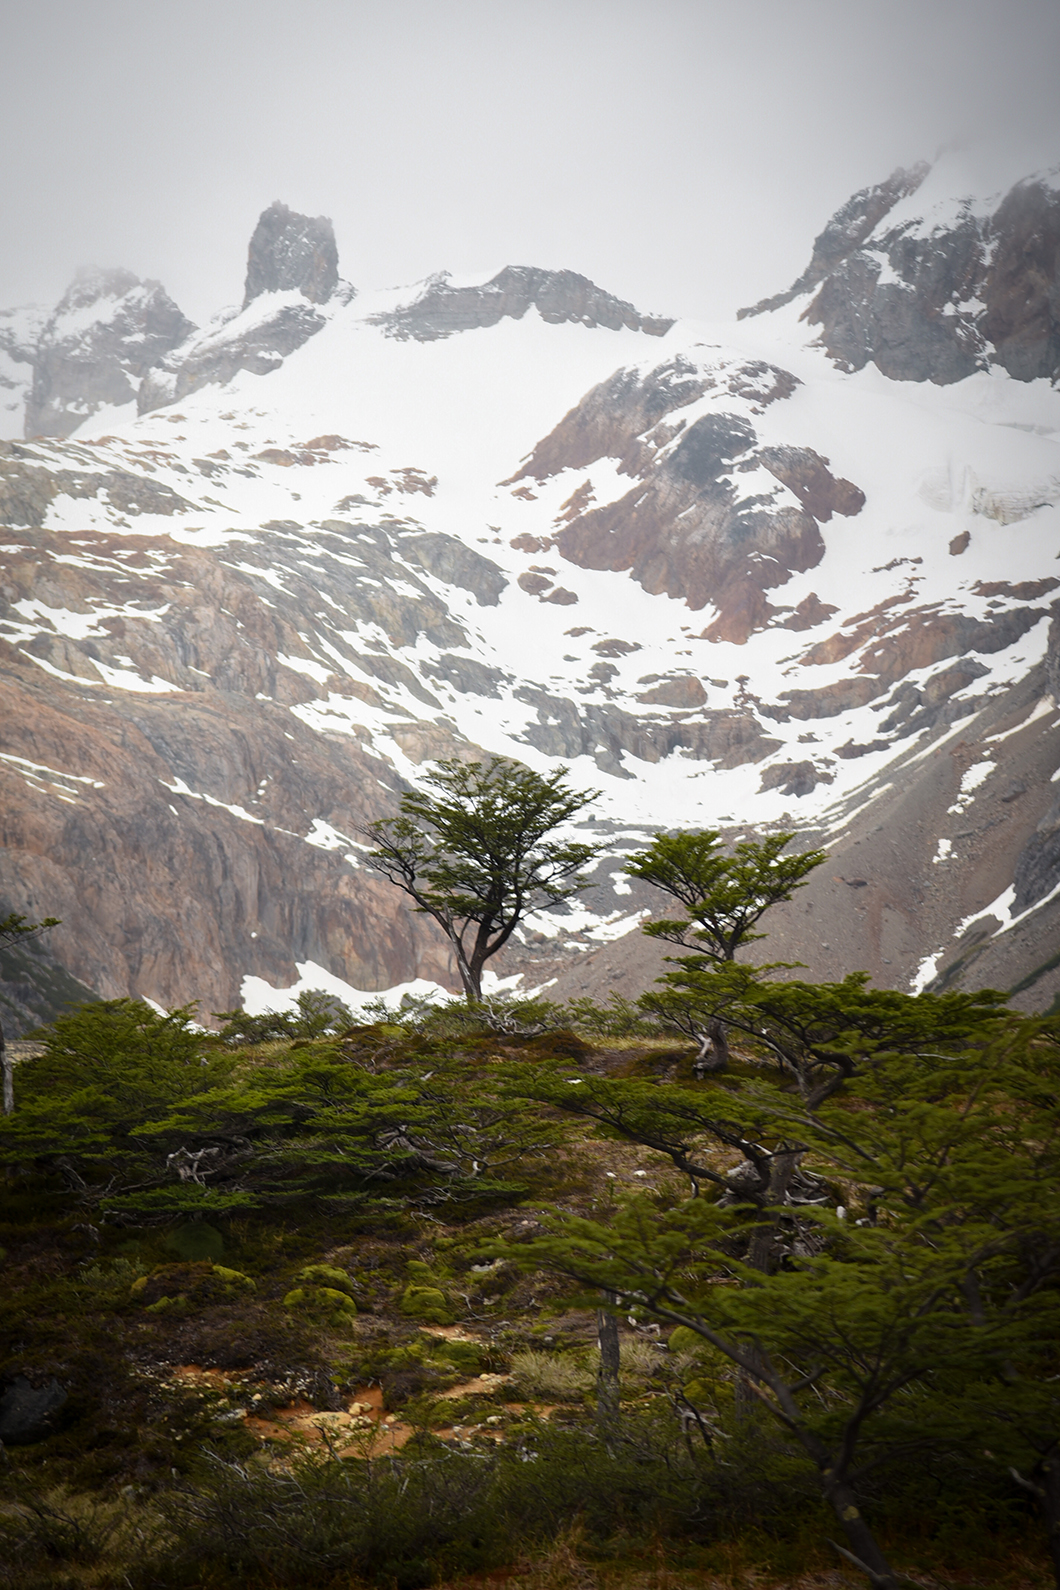 Découvrir Ushuaia et la Laguna Esmeralda